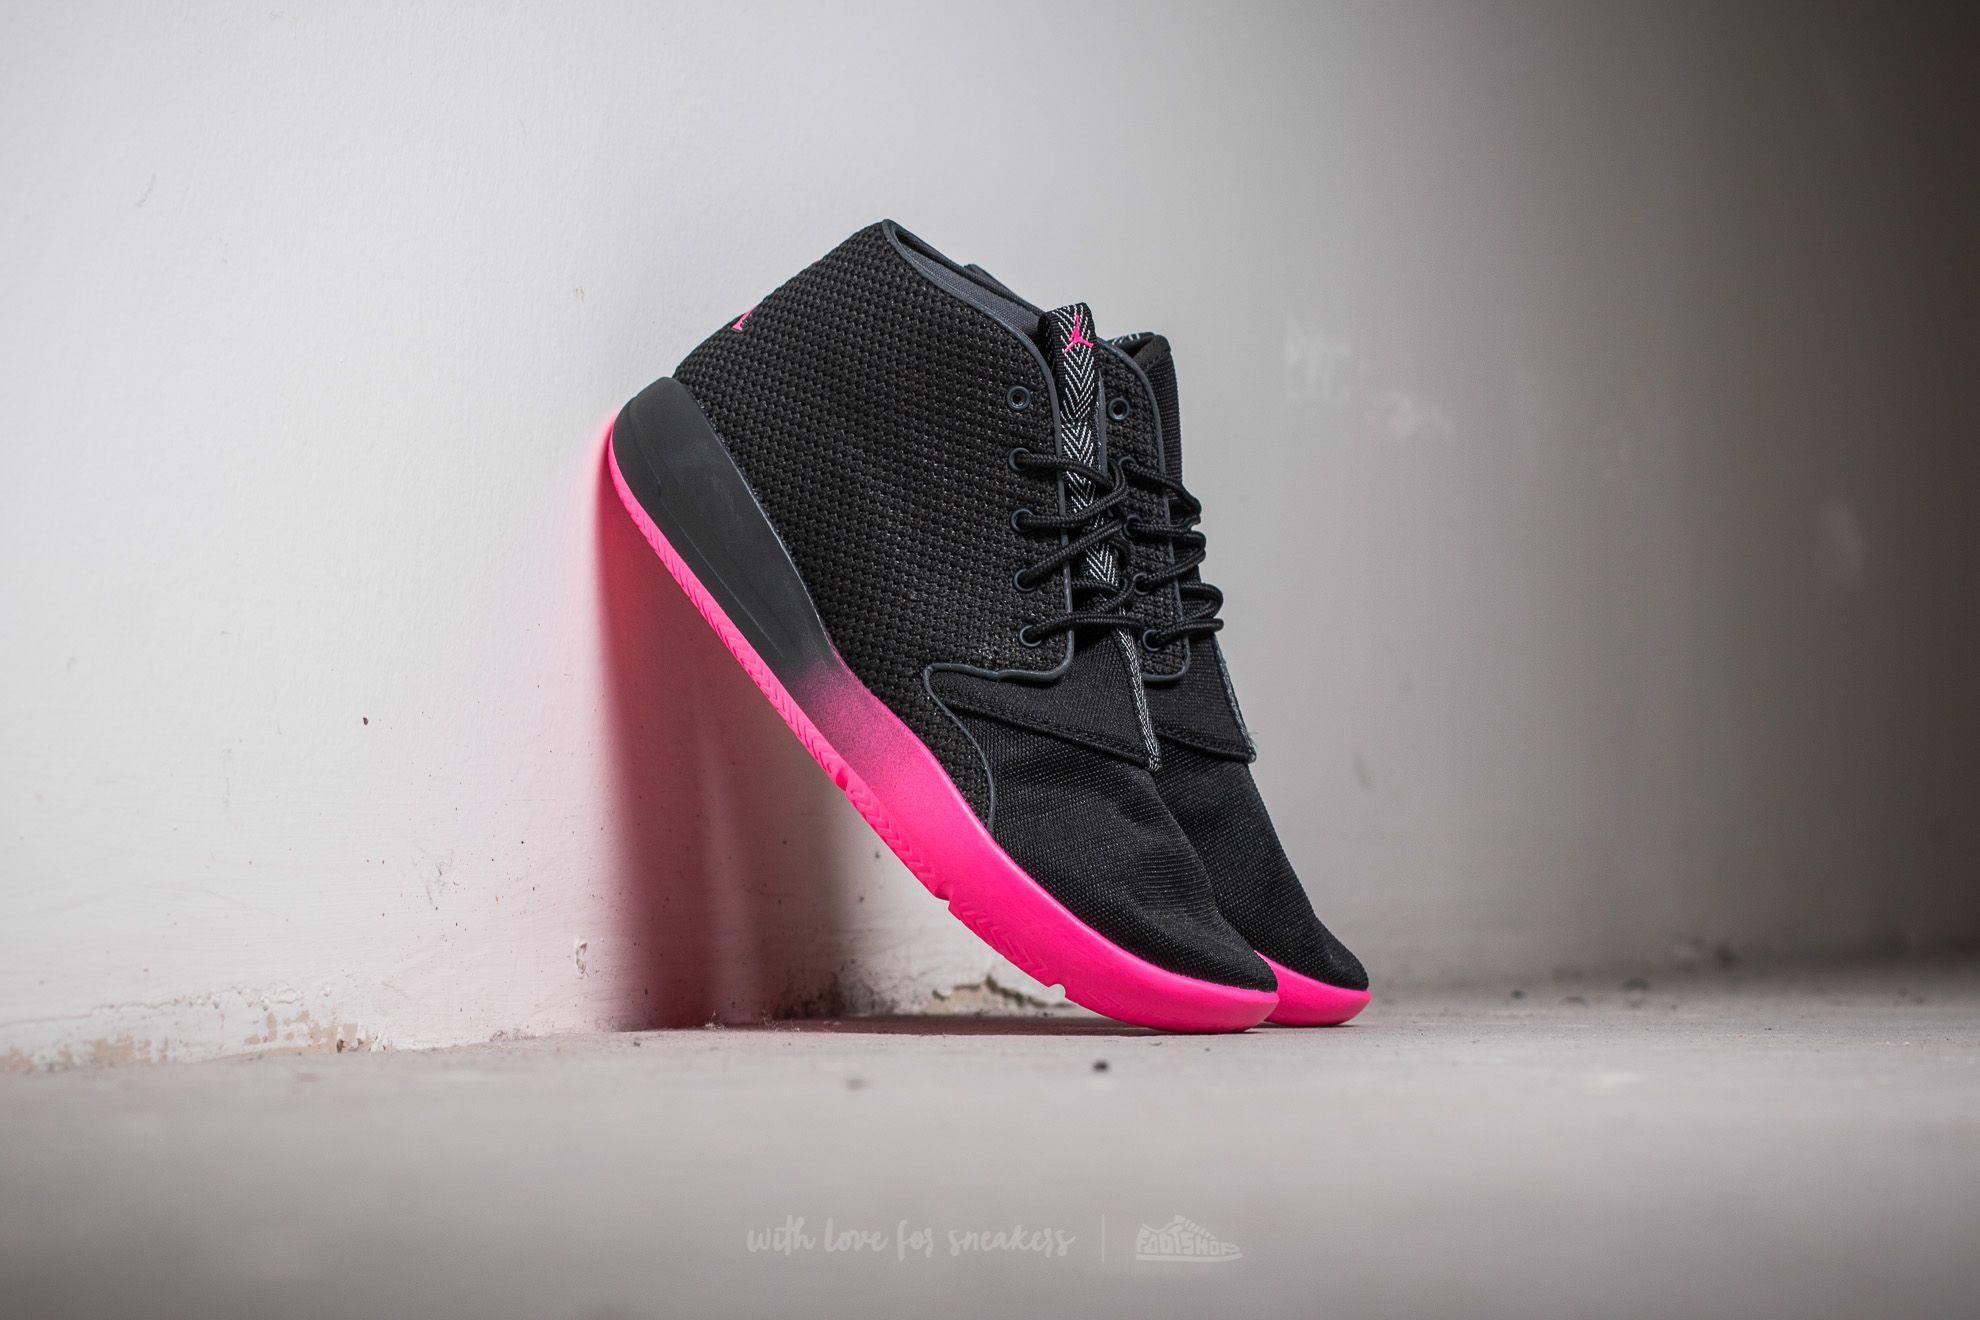 Jordan Eclipse Chukka GG Black/ Hyper Pink-Anthracite